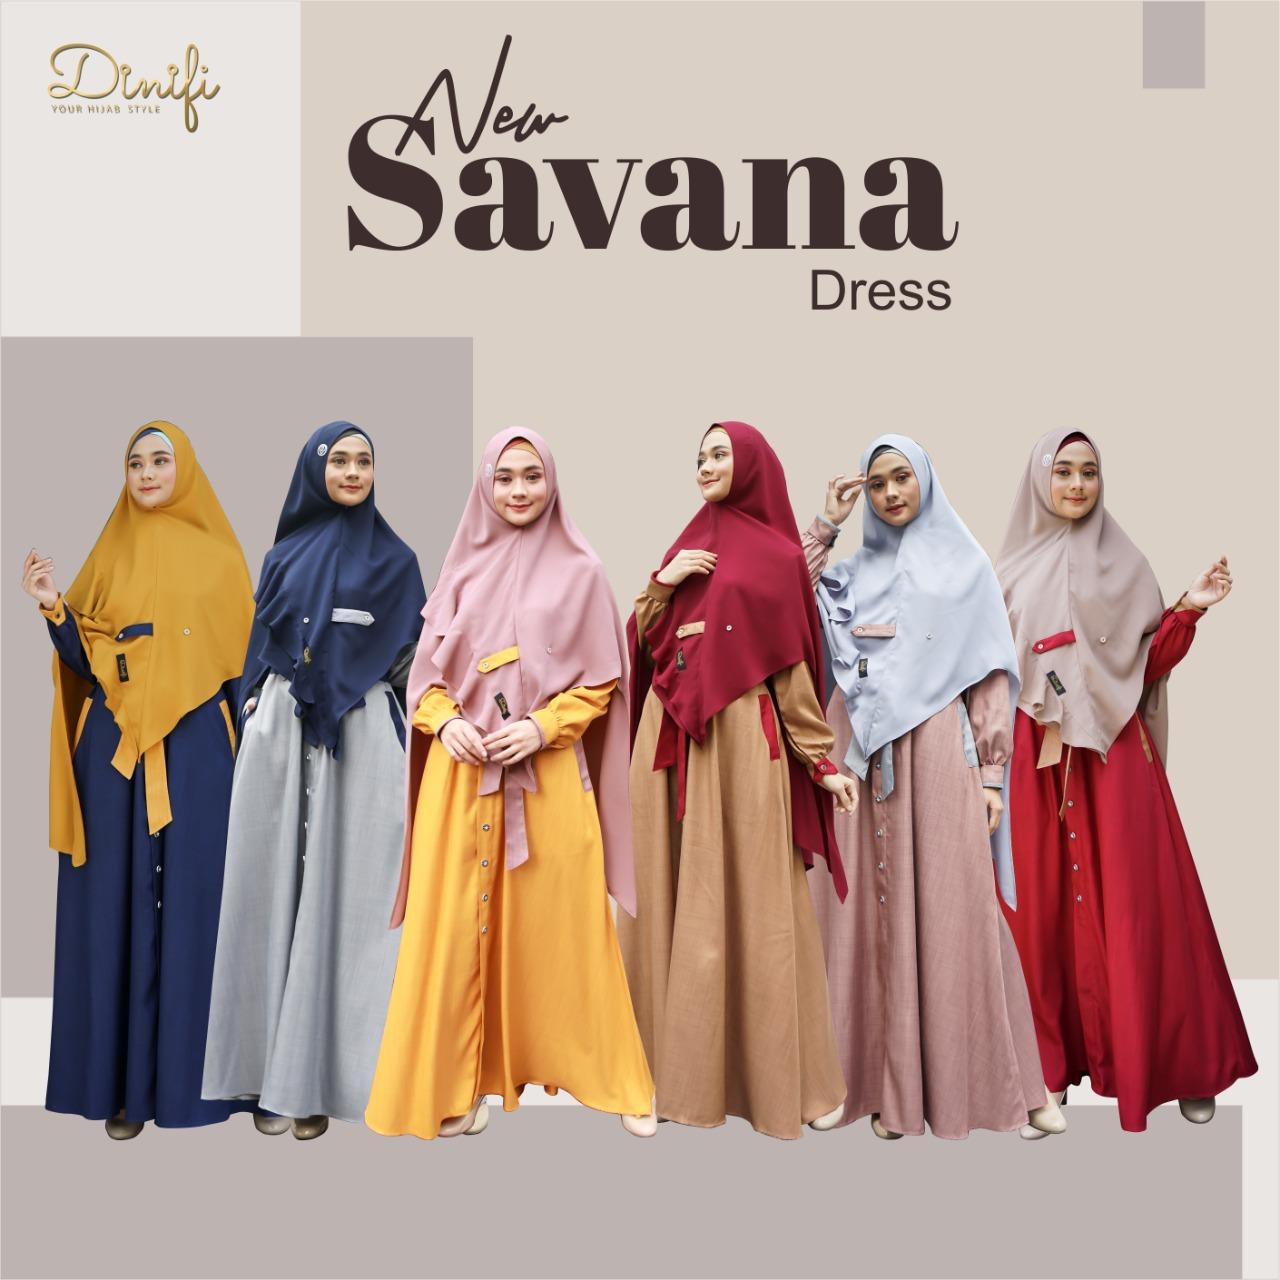 New Savana Dress